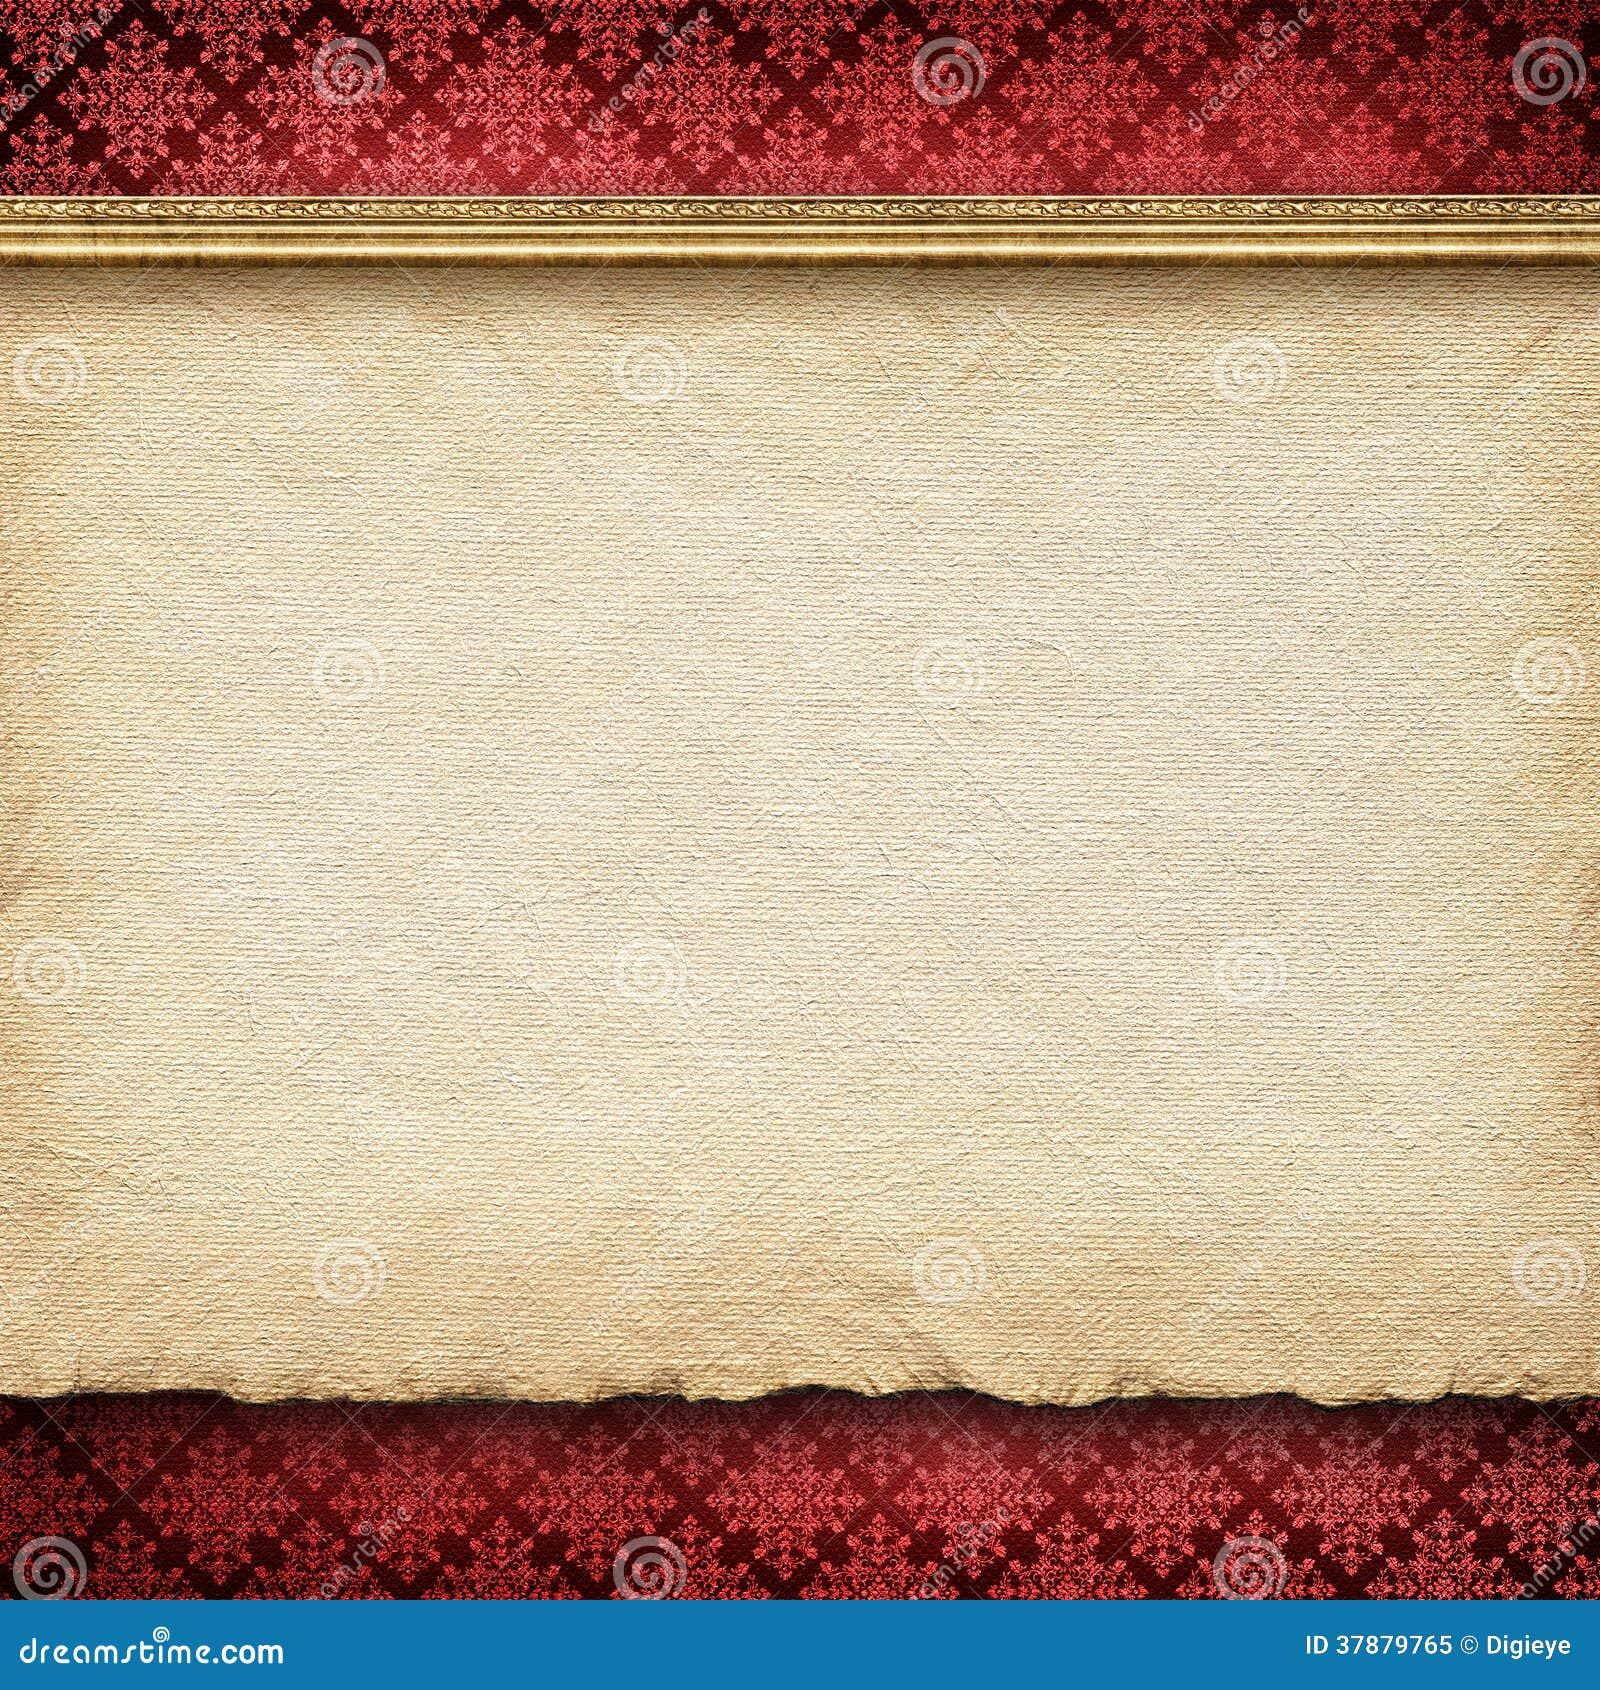 Double-layered malplaatje als achtergrond